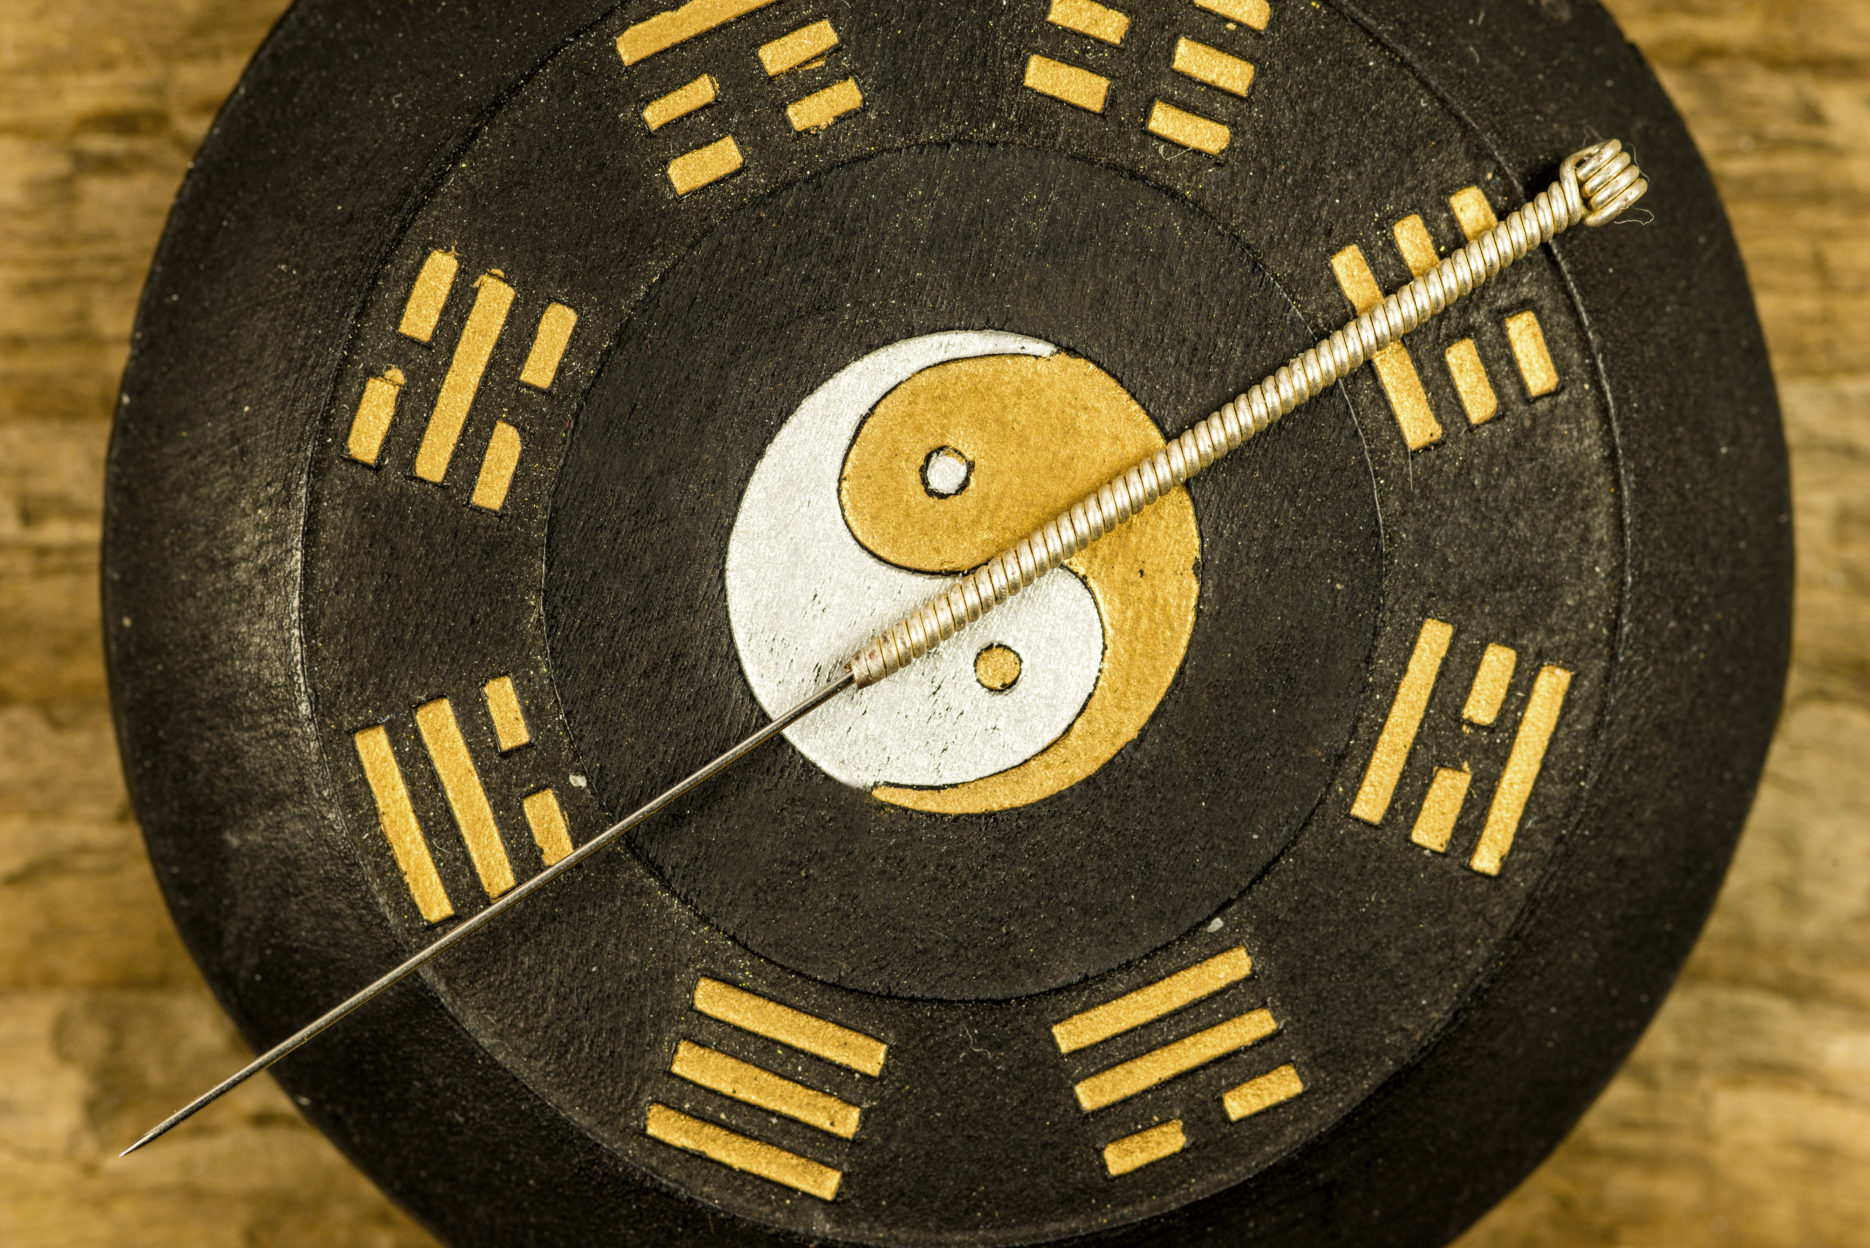 Acupuncture needle on Yin & Yang